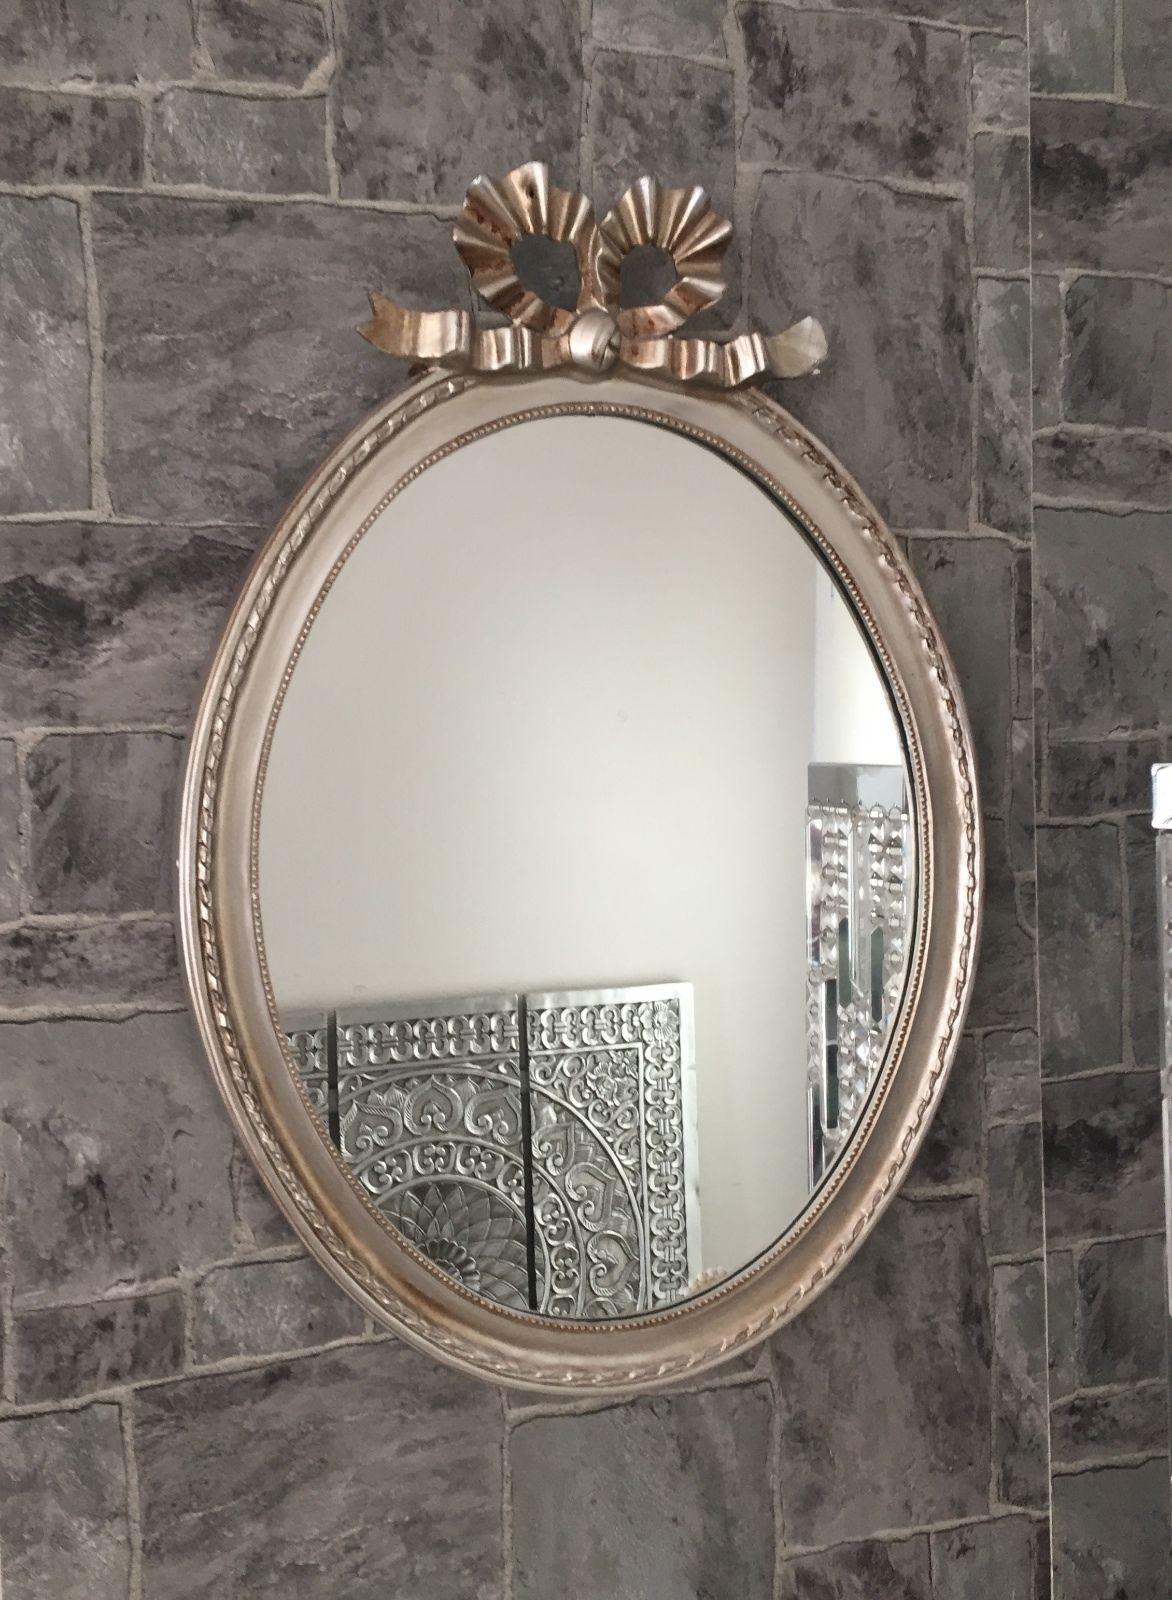 wandspiegel oval silber barock 58 x 42 schleife wanddeko antik badspiegel shabby kaufen bei. Black Bedroom Furniture Sets. Home Design Ideas